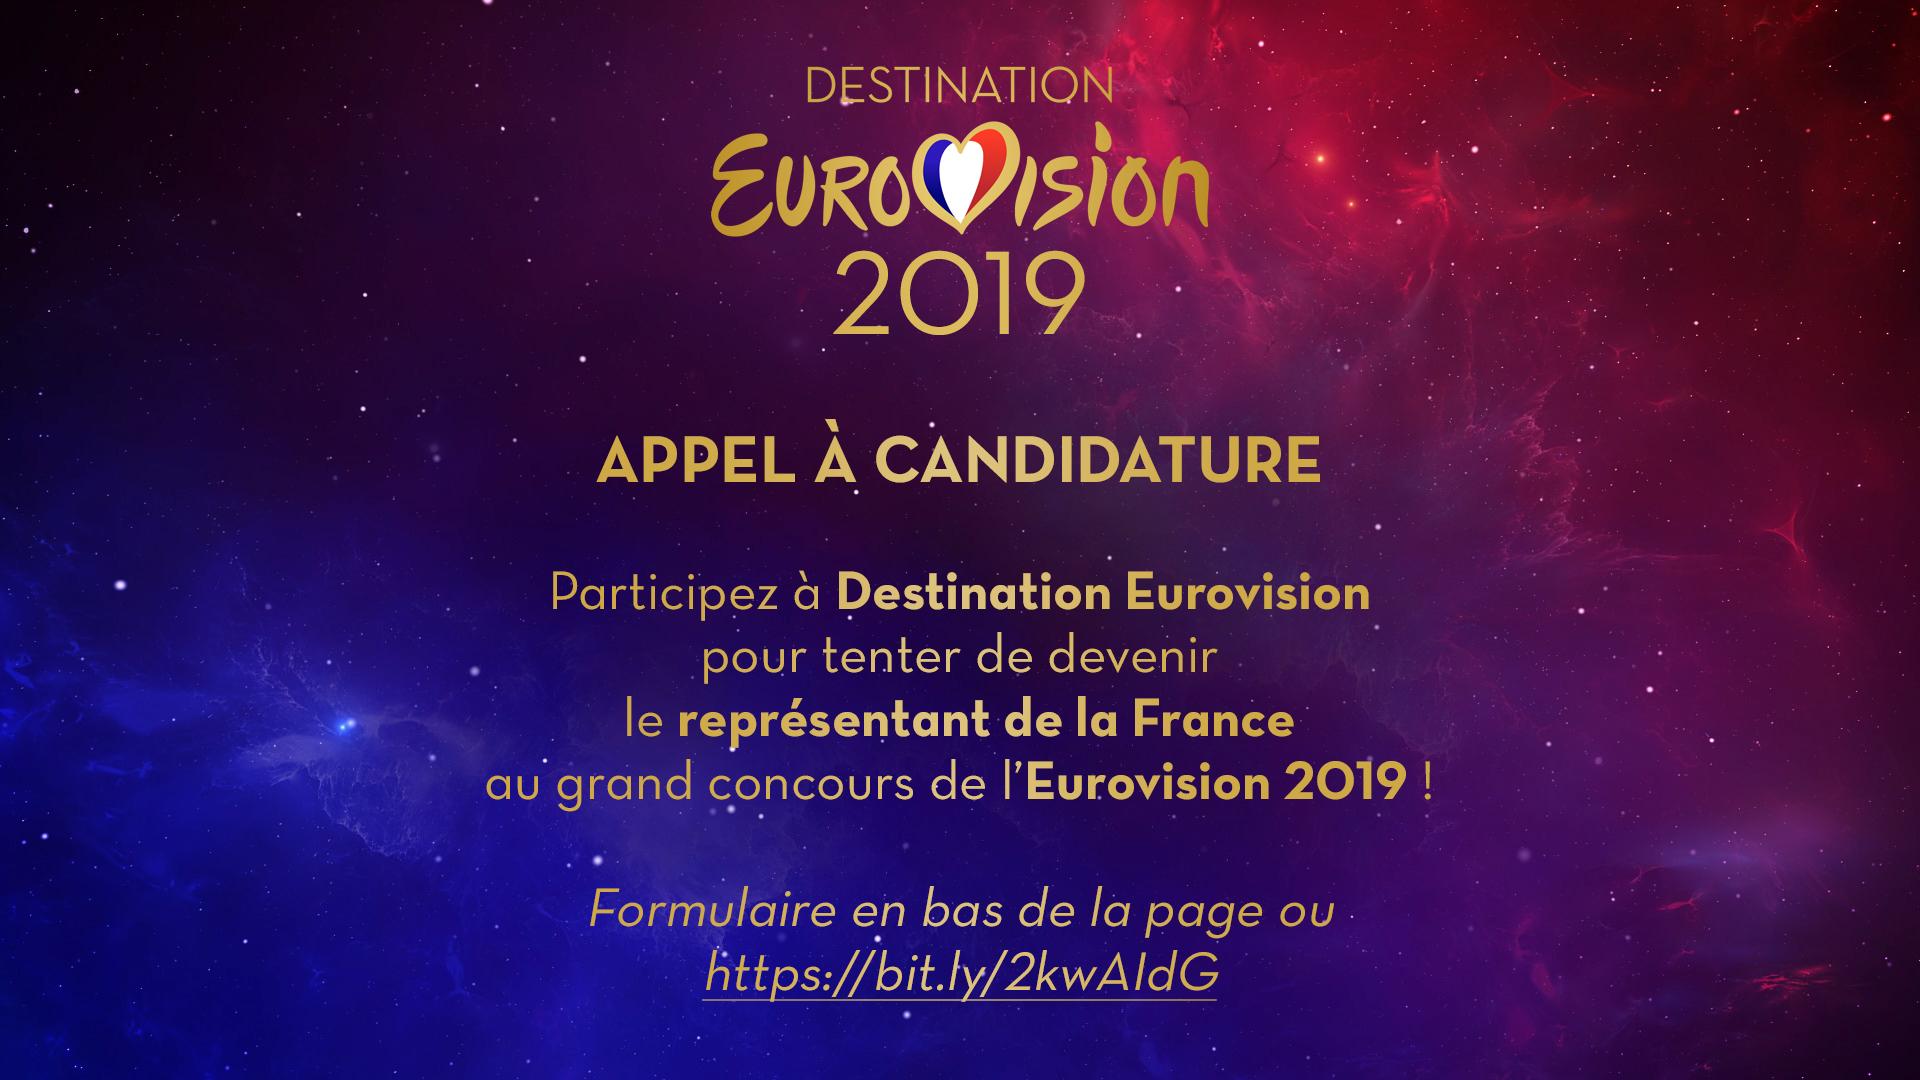 France 2019: Destination Eurovision 2019 kicks off